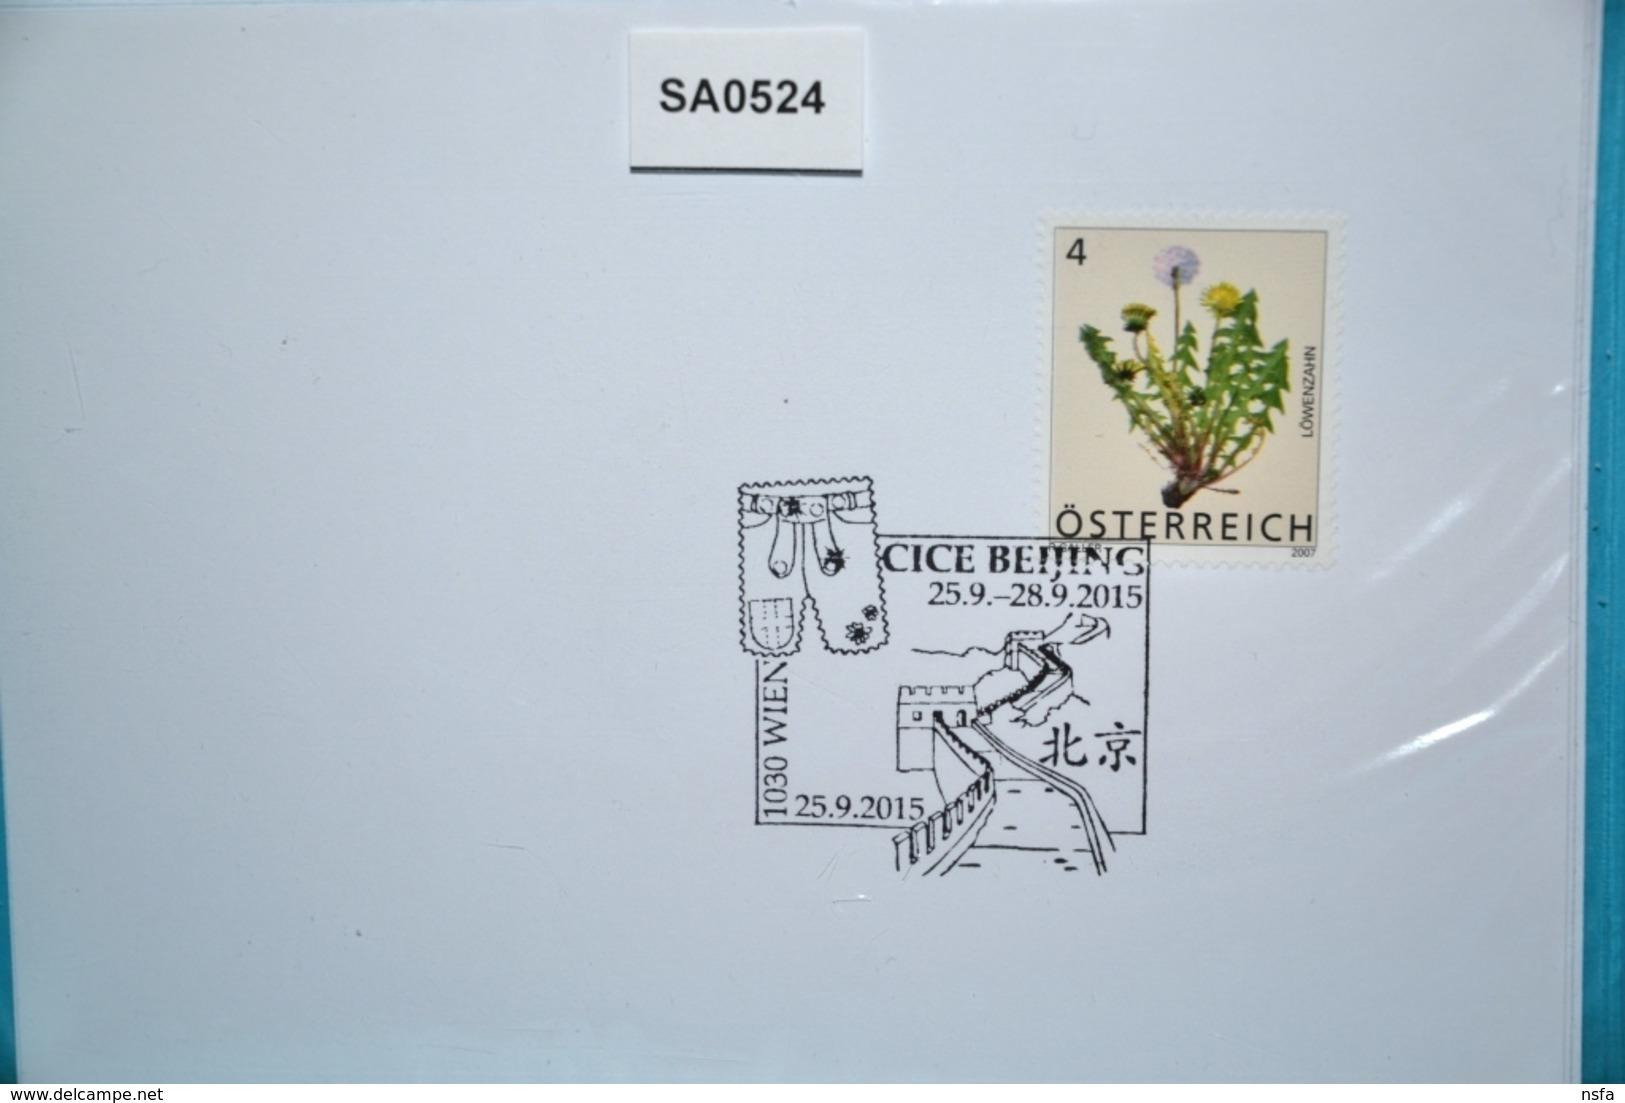 SA0524 CICE Beijing, BM-Auss., Chinesische Mauer, Lederhose, China, 1030 Wien 25.9.15 - Machine Stamps (ATM)